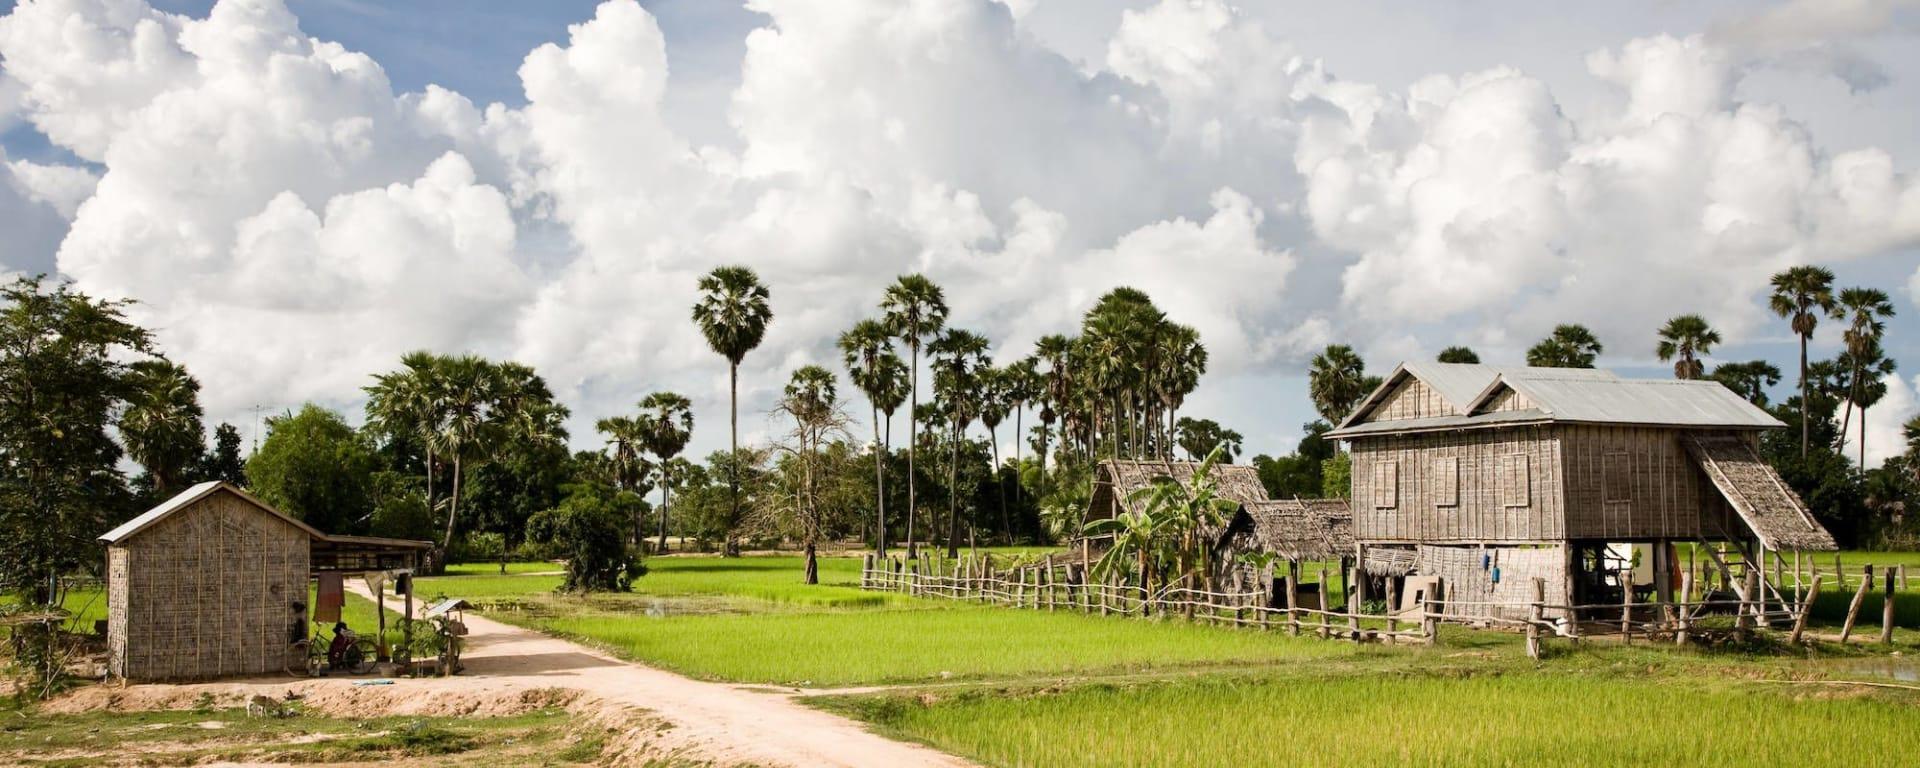 Battambang - Die Reiskammer Kambodschas (Siem Reap - Ko Chang): Battambang rural aerea